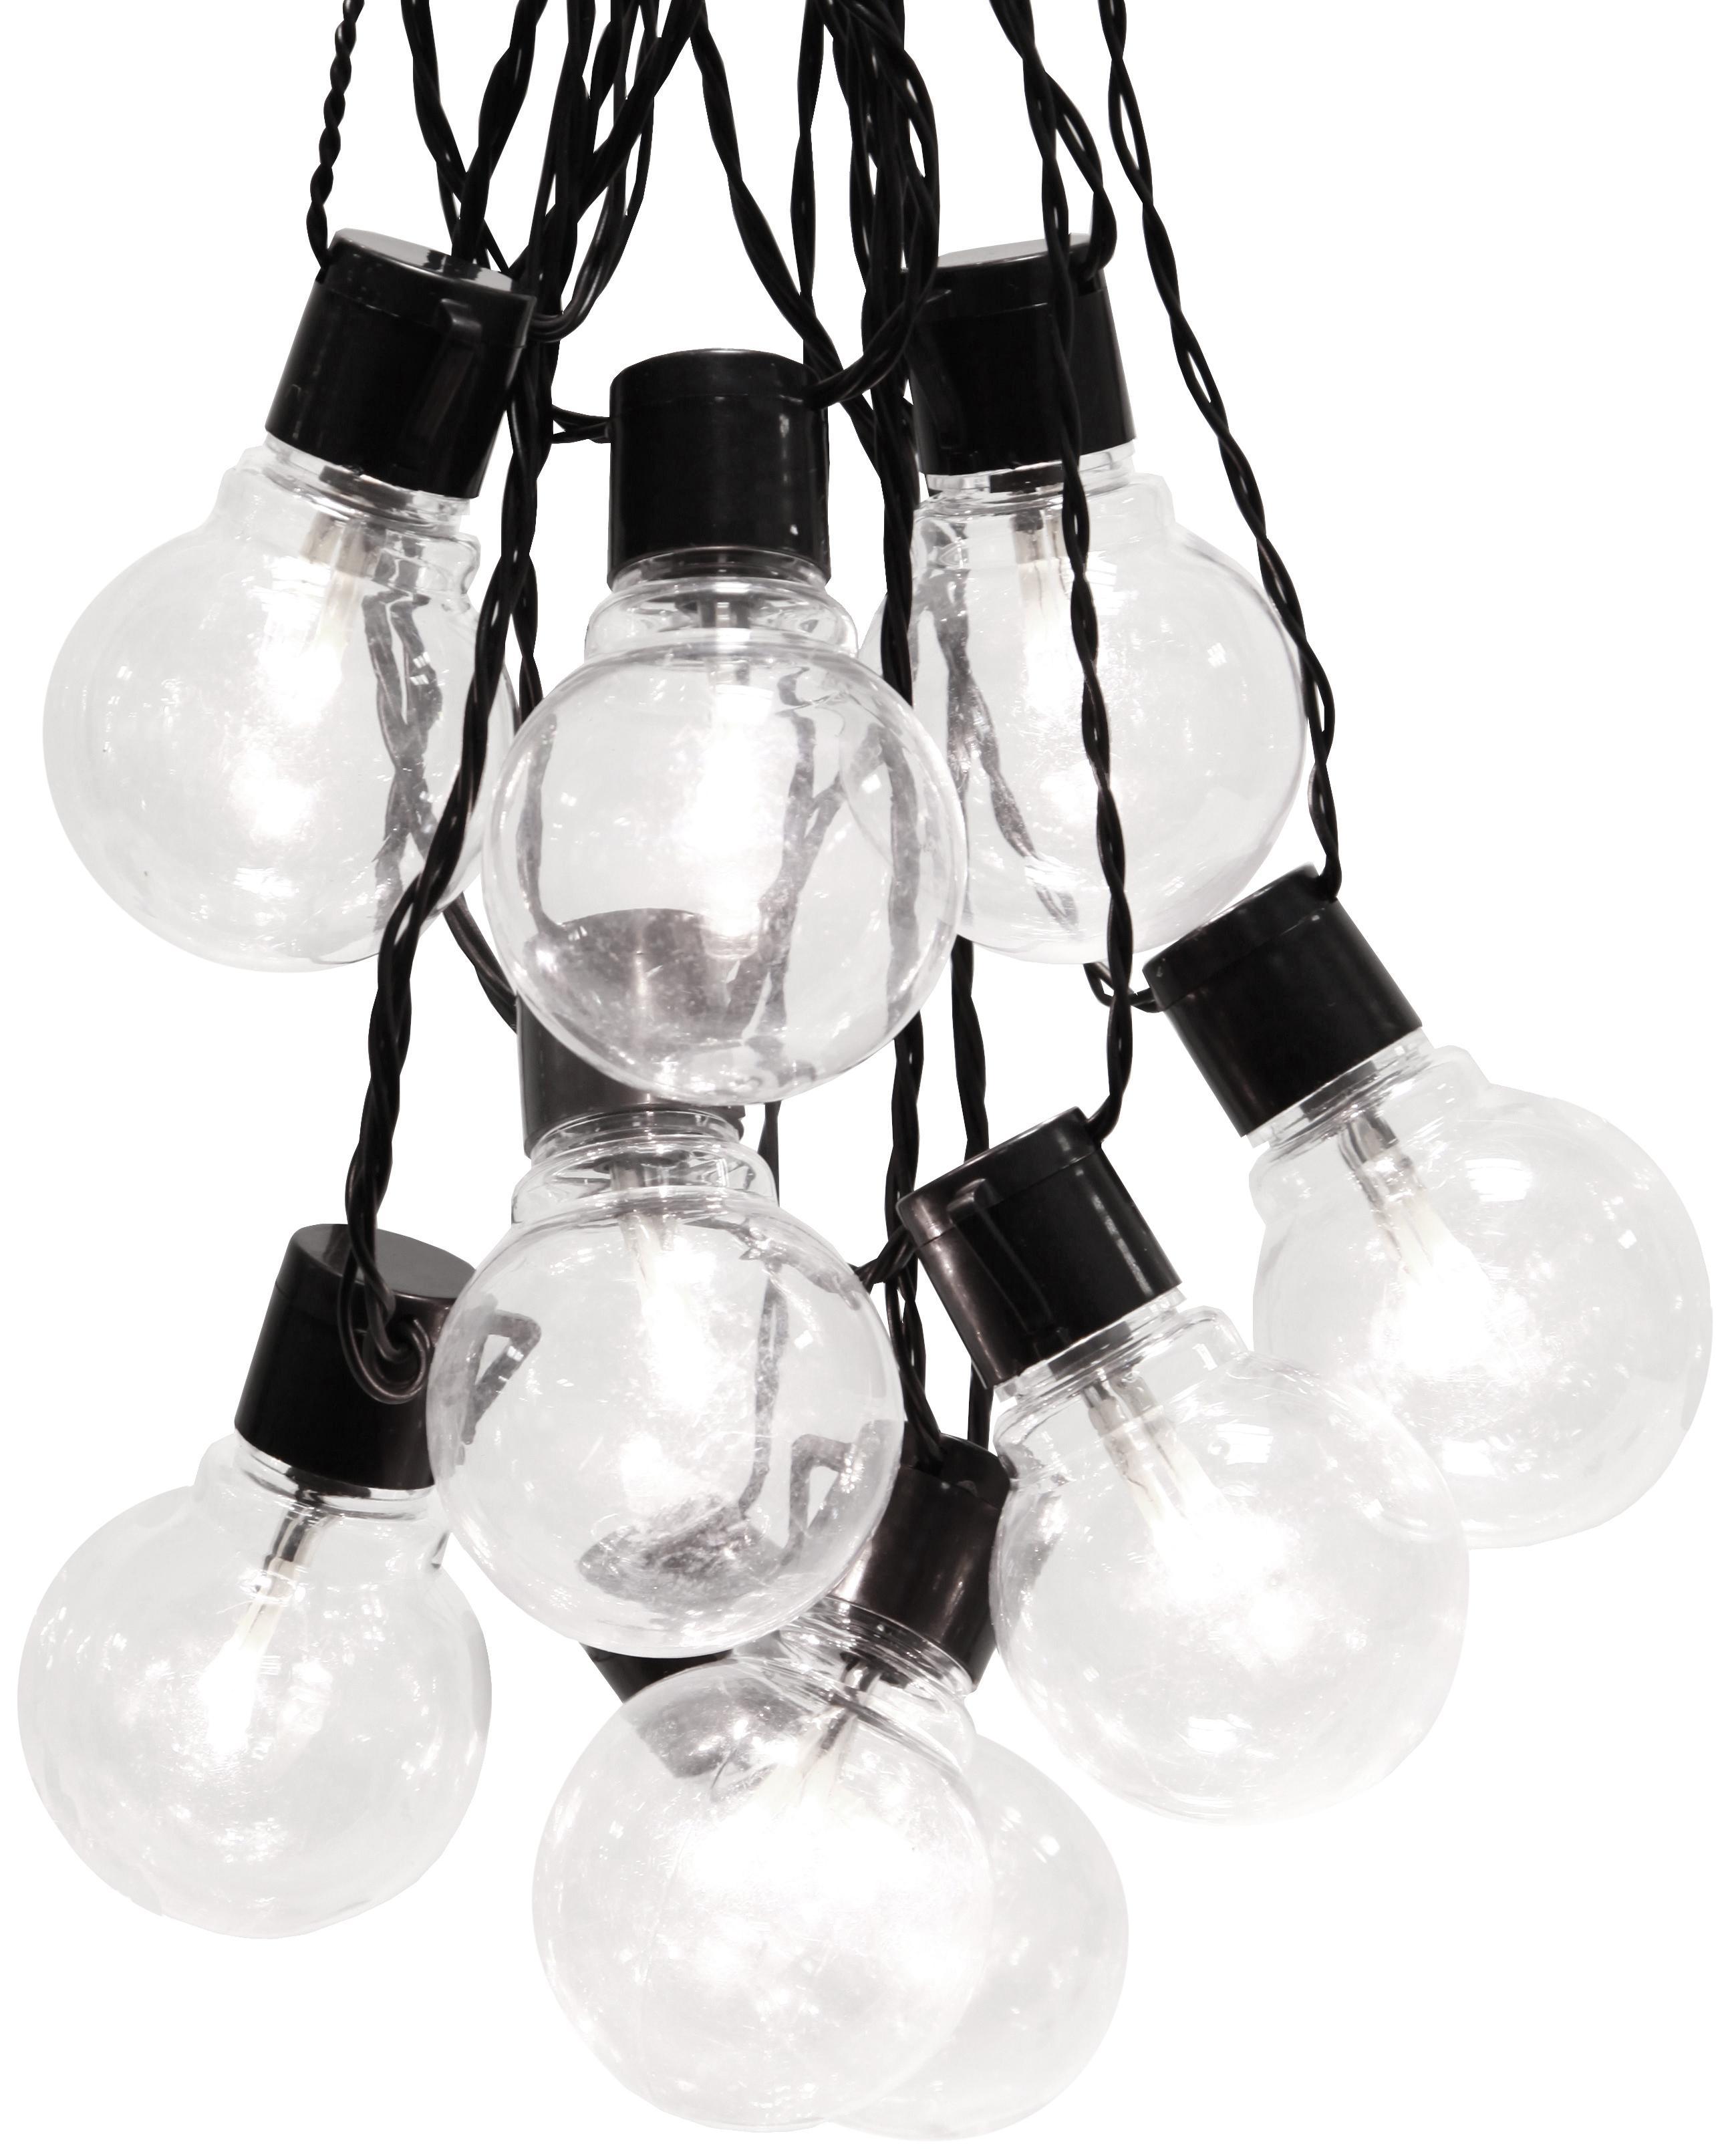 LED lichtslinger Partaj, 950 cm, Zwart, L 500 cm